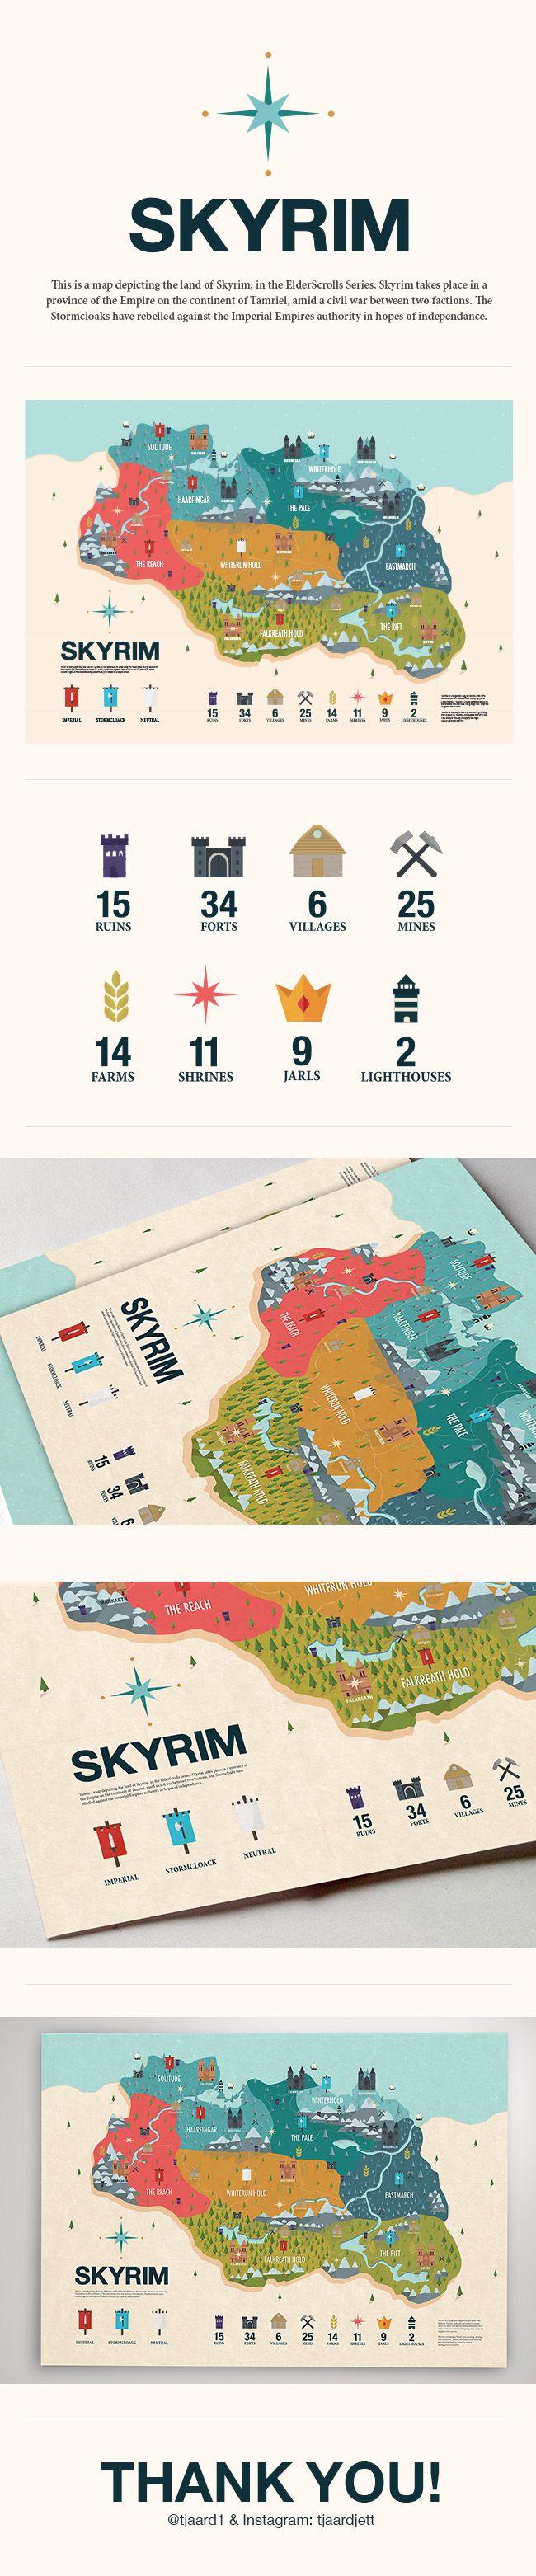 SKYRIM Infographic on Behance